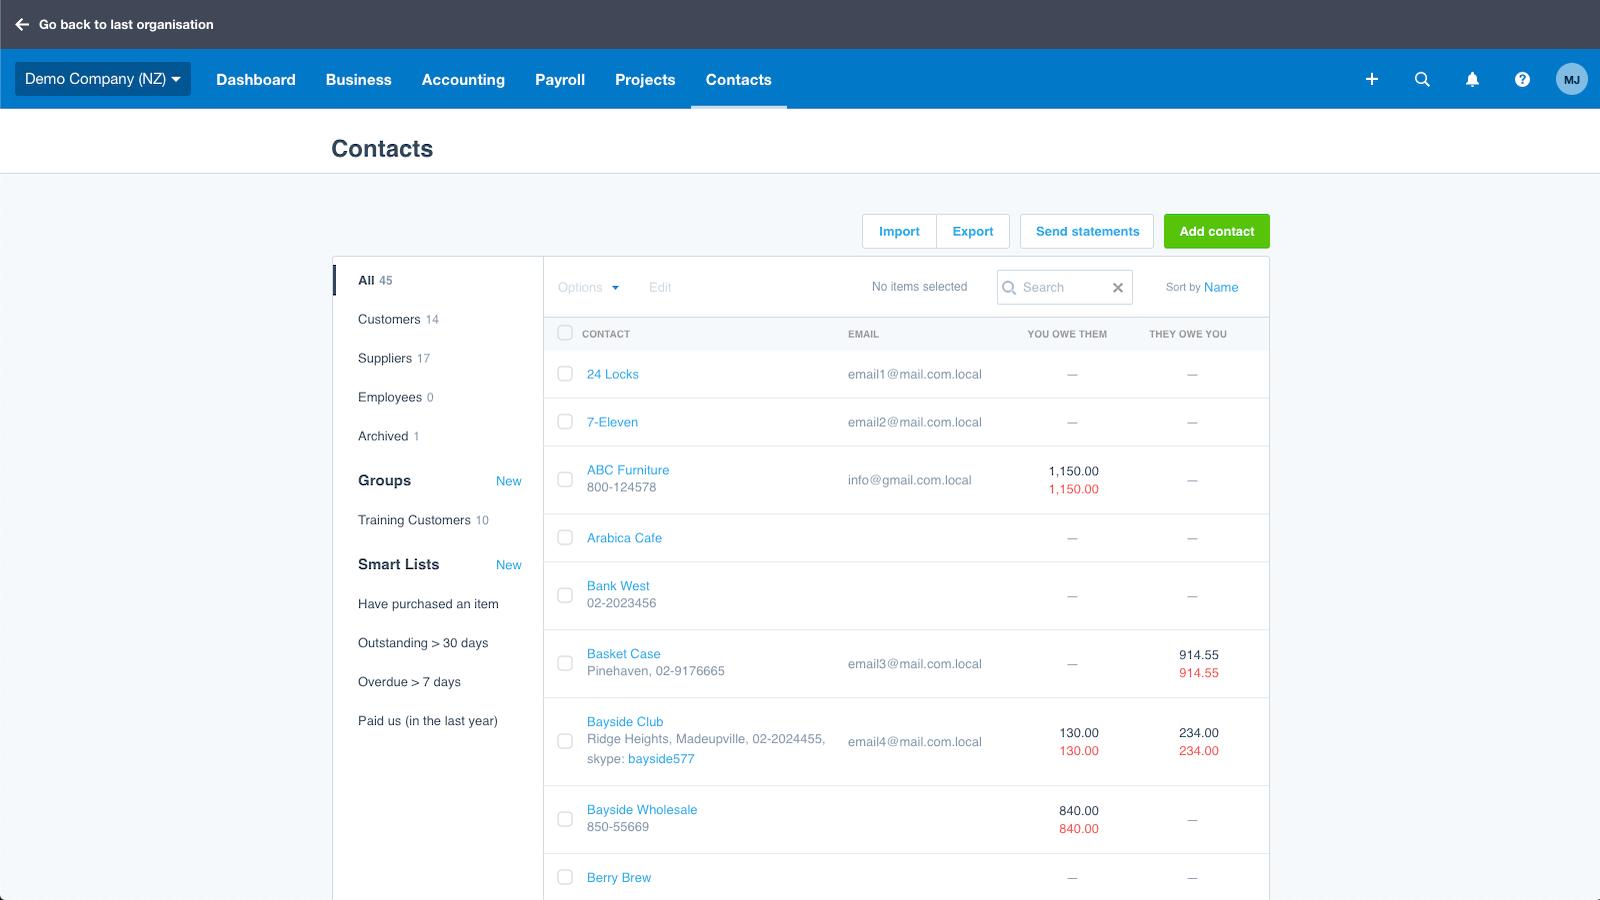 HubSpot's integration with Xero